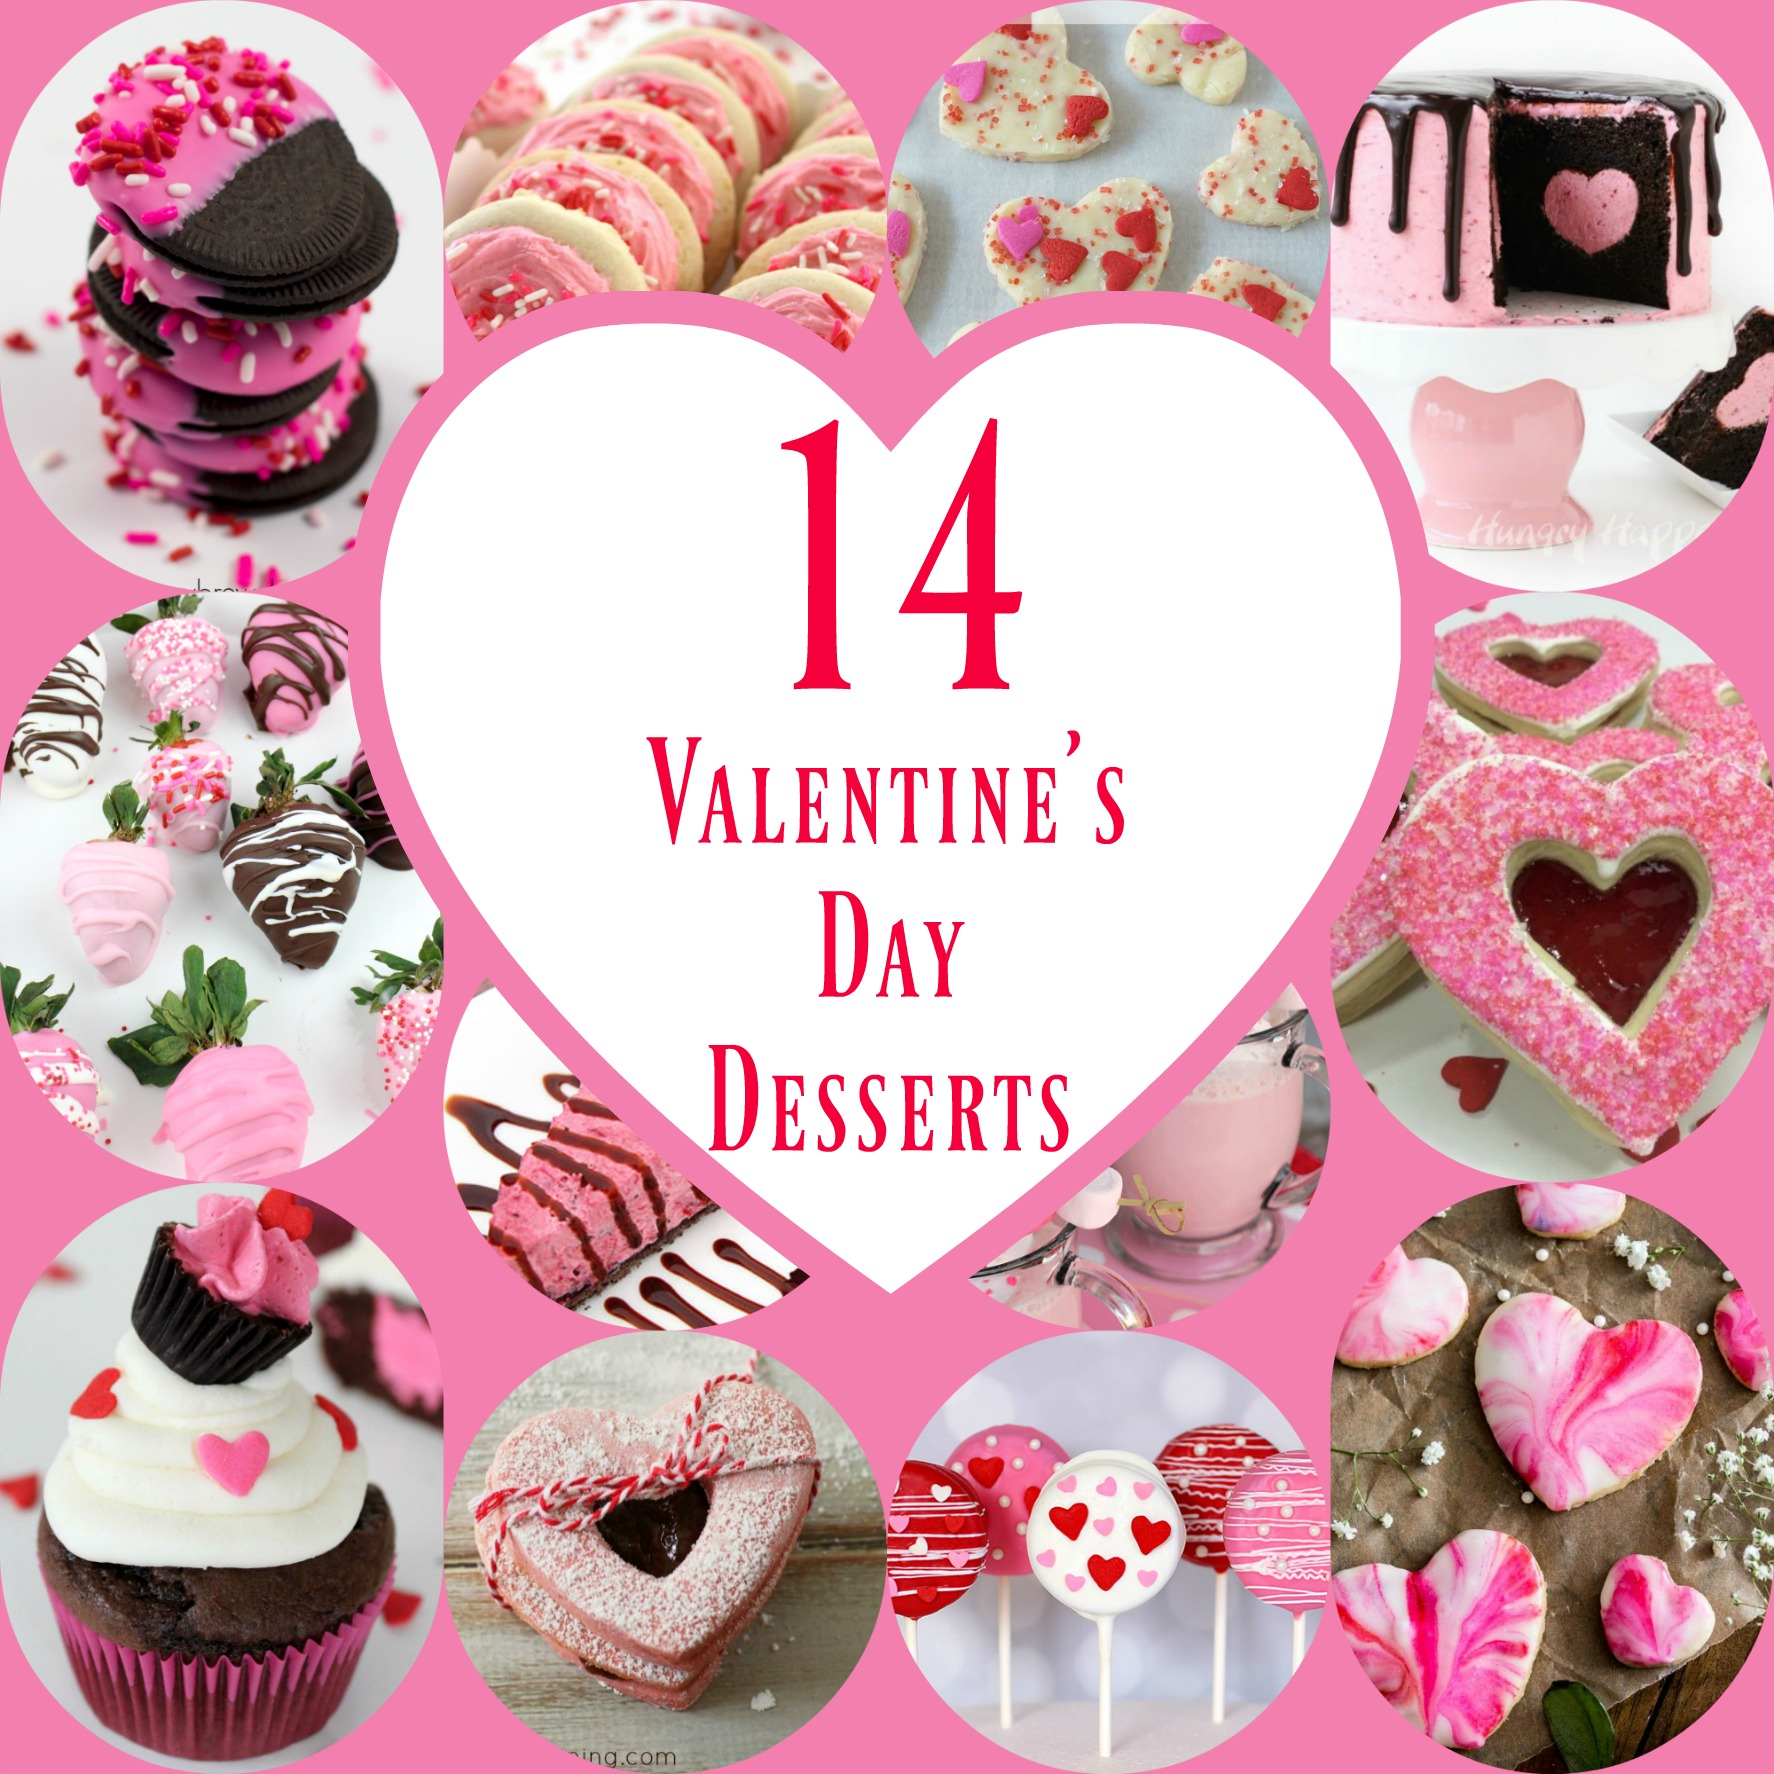 valentines-day-recipes-dessert-sweet-treats1.jpg